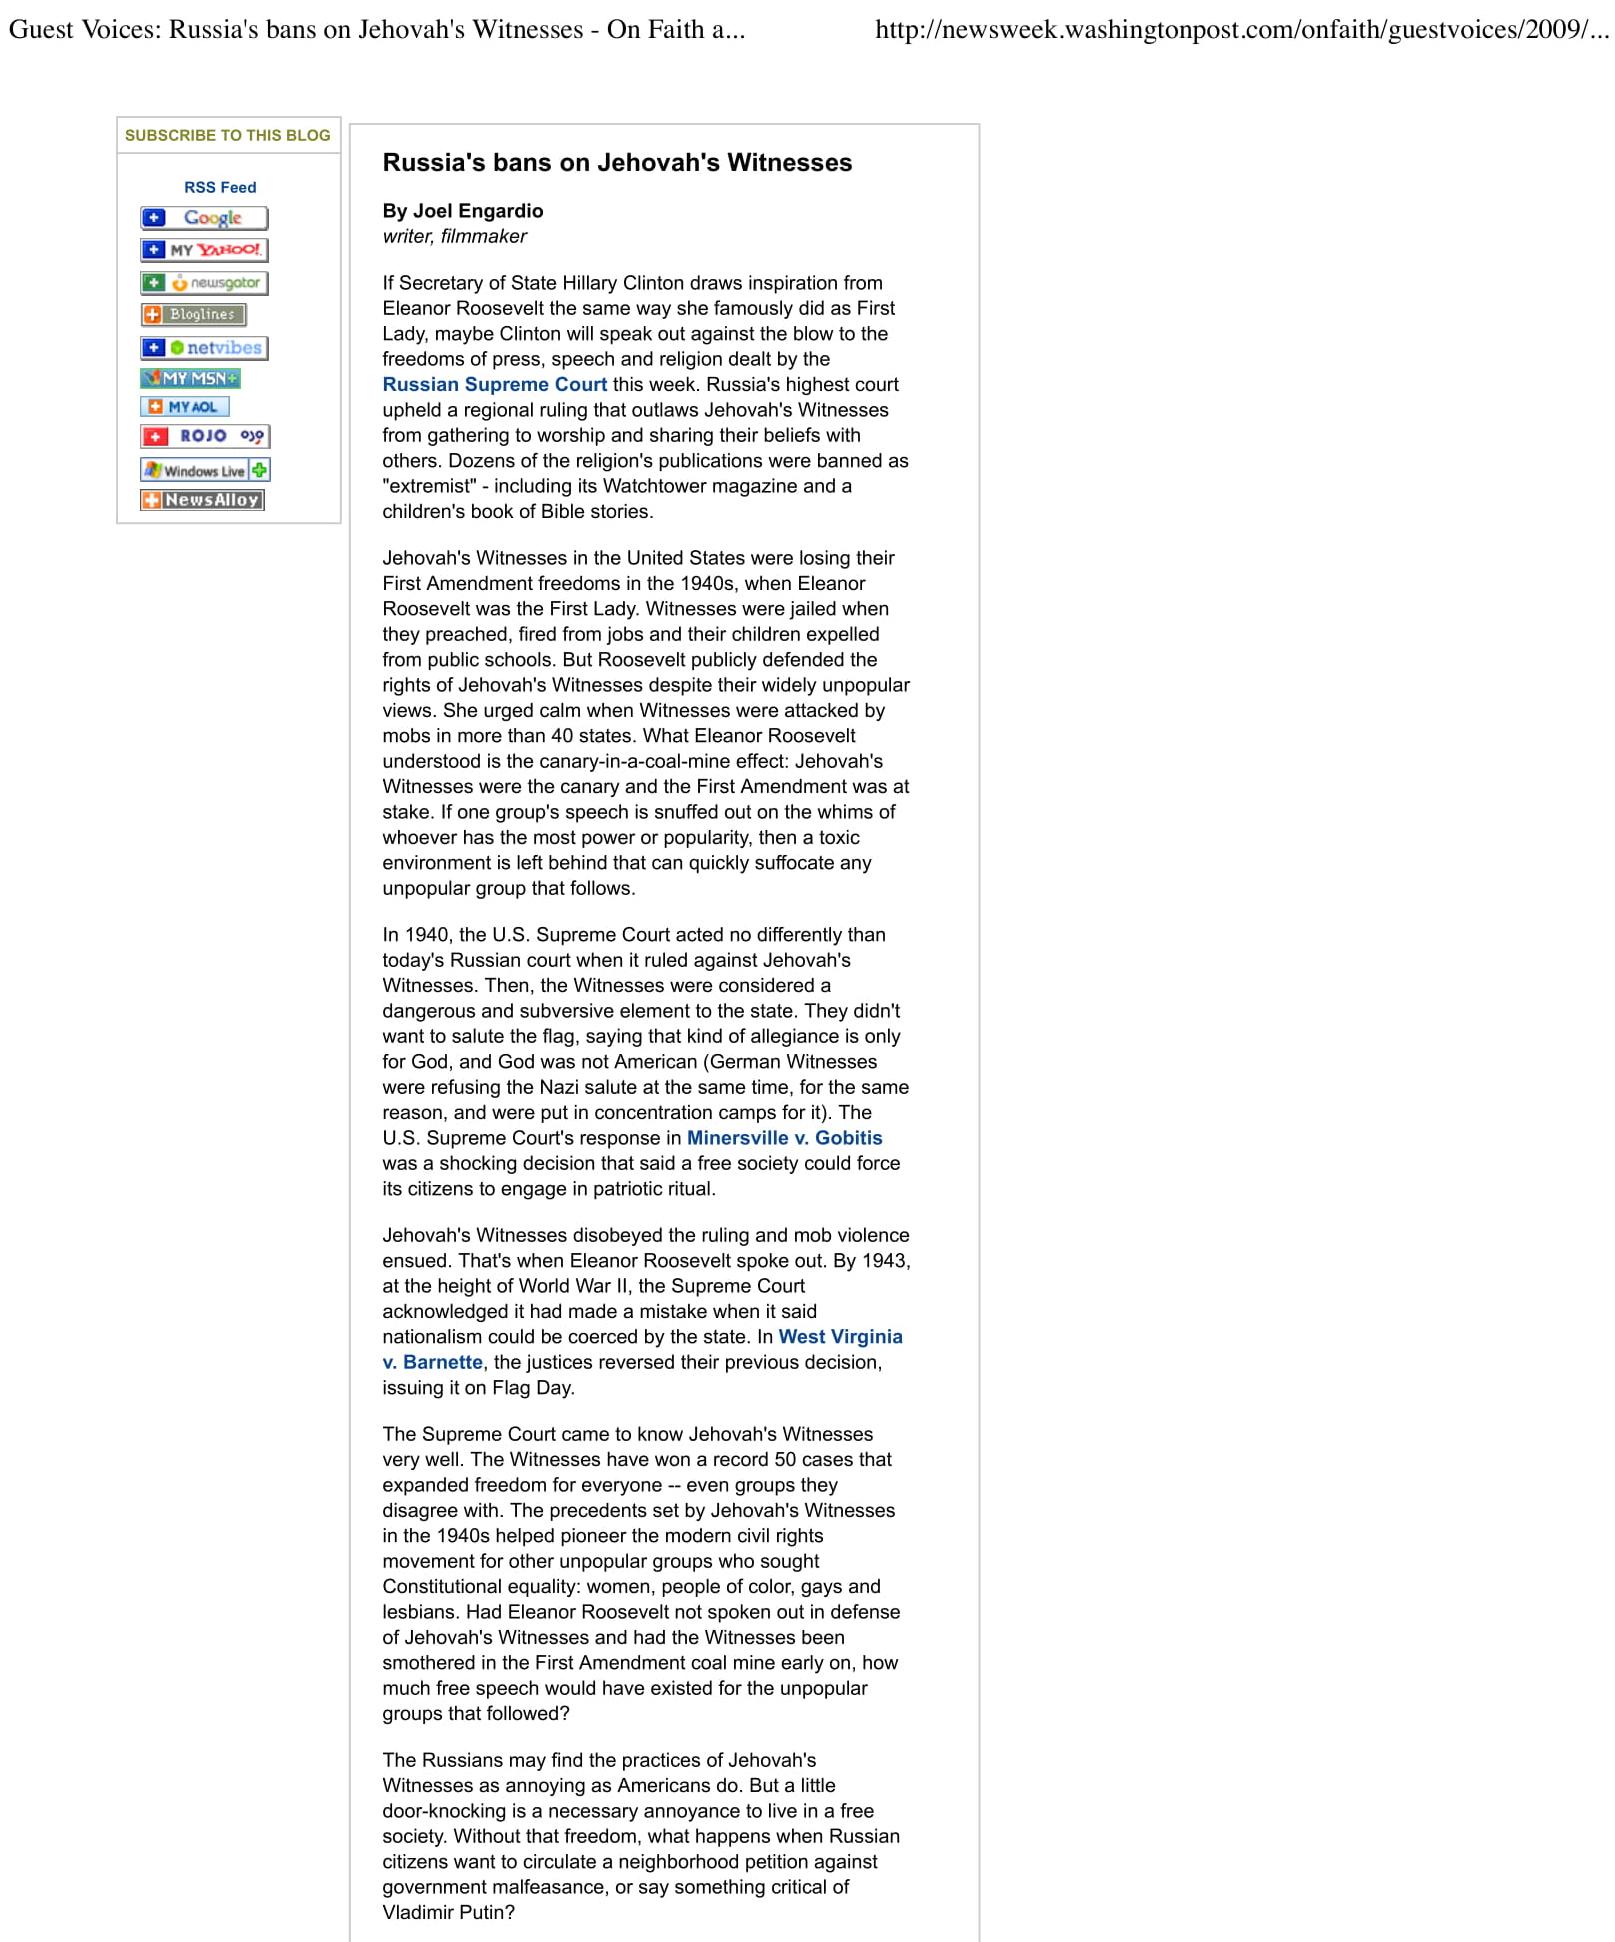 WashPost Russia JW Ban Dec10_2009a.jpg